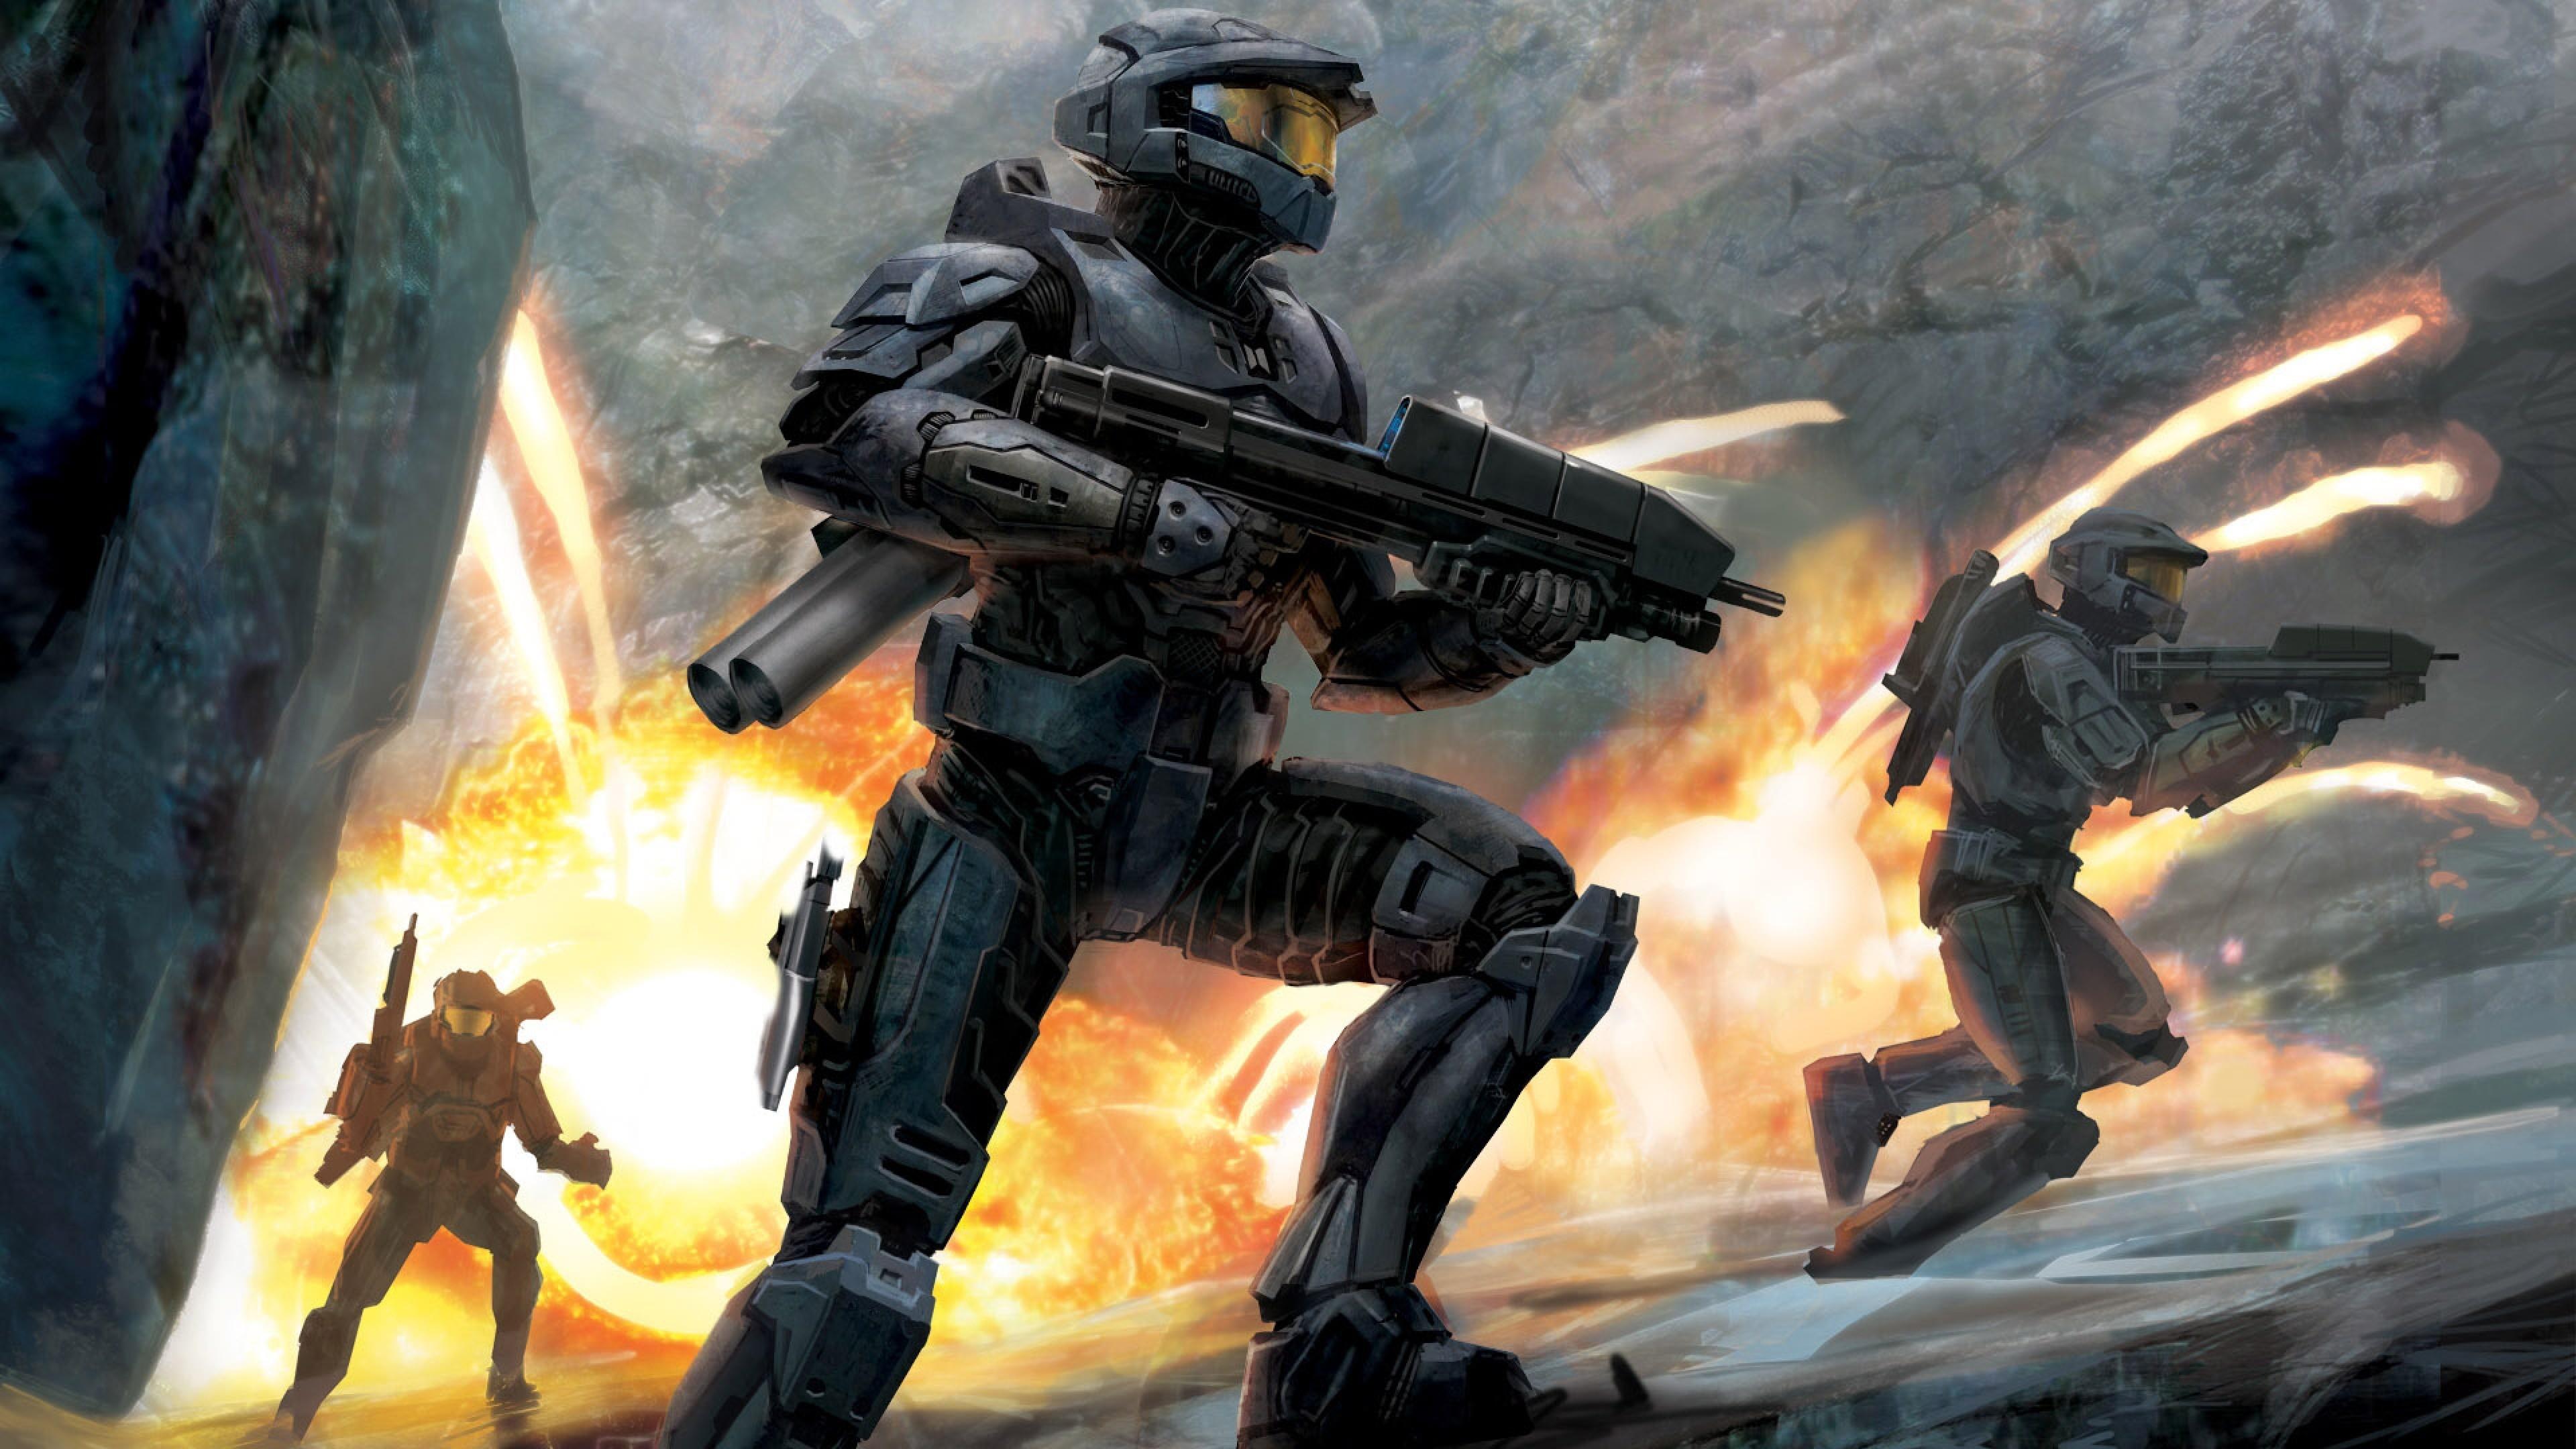 Wallpaper halo, soldiers, fire, gun